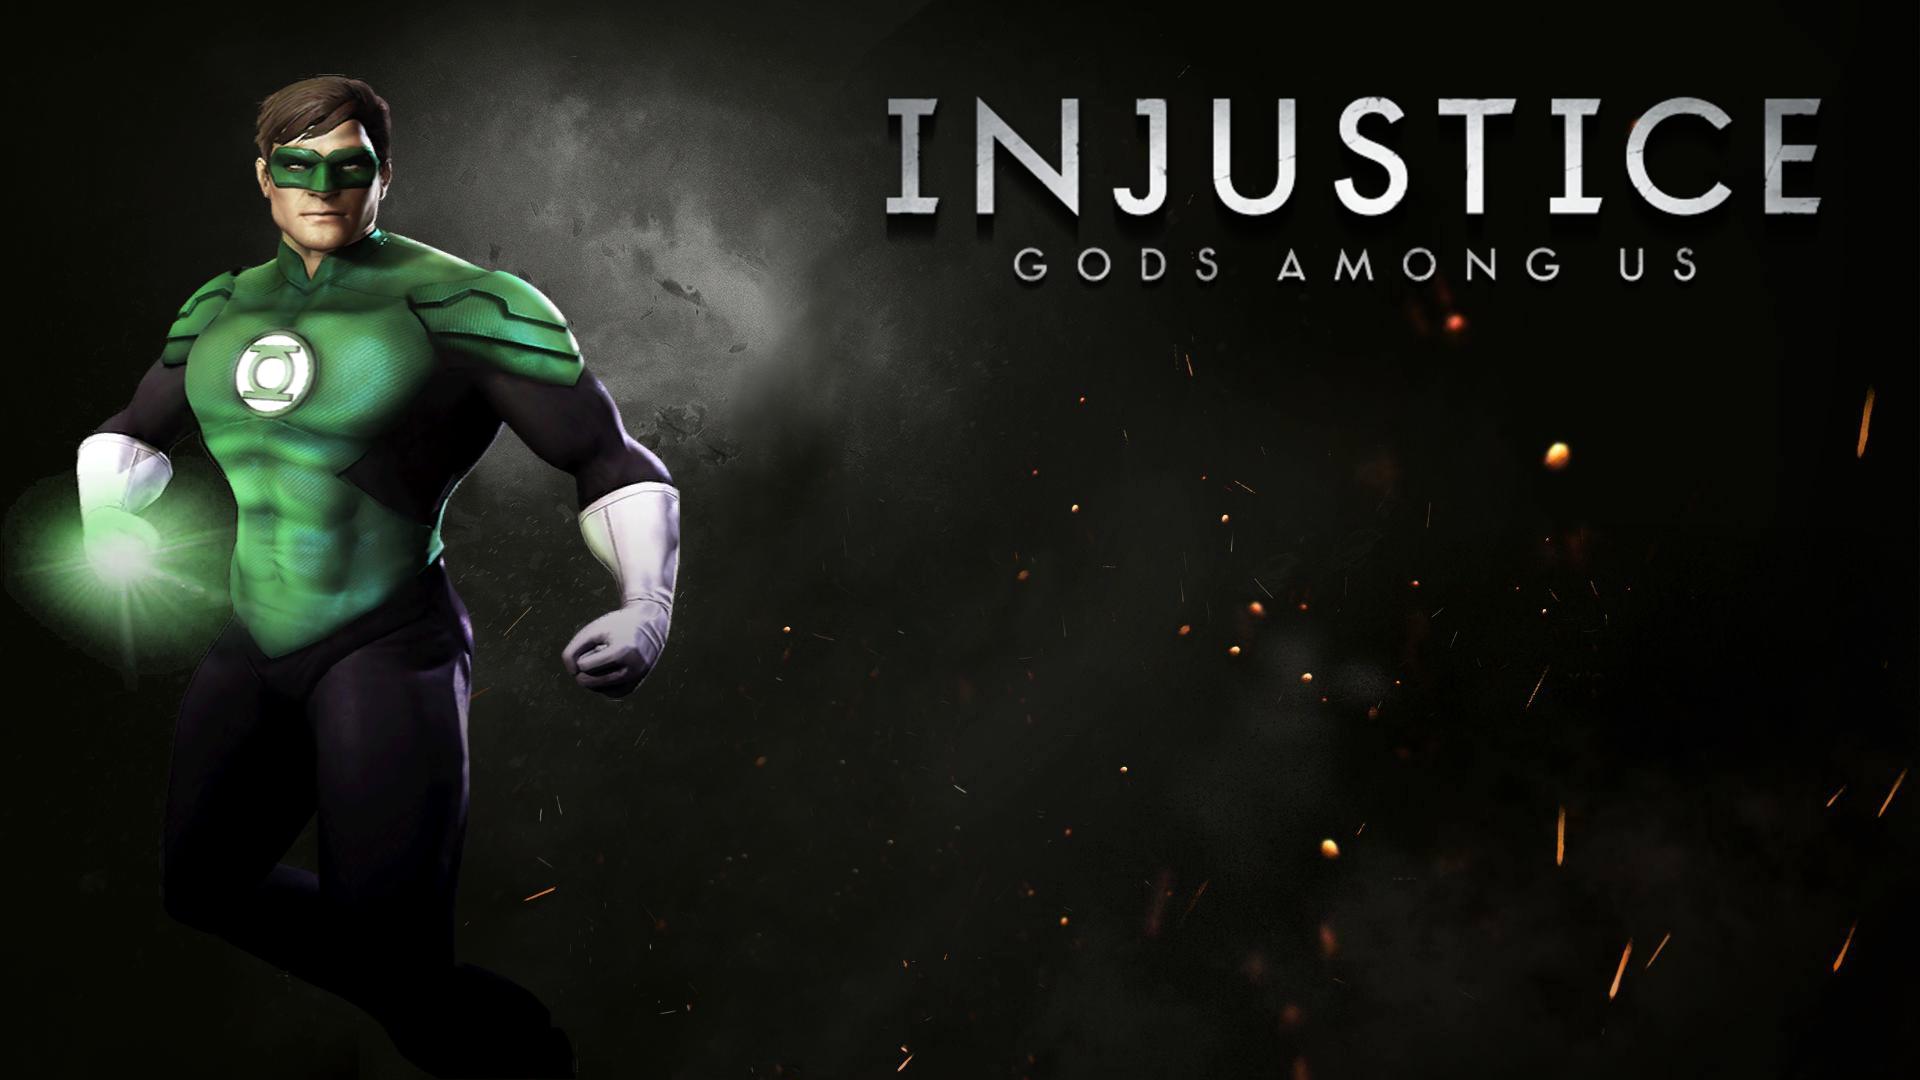 New 52 Green Lantern Wallpaper